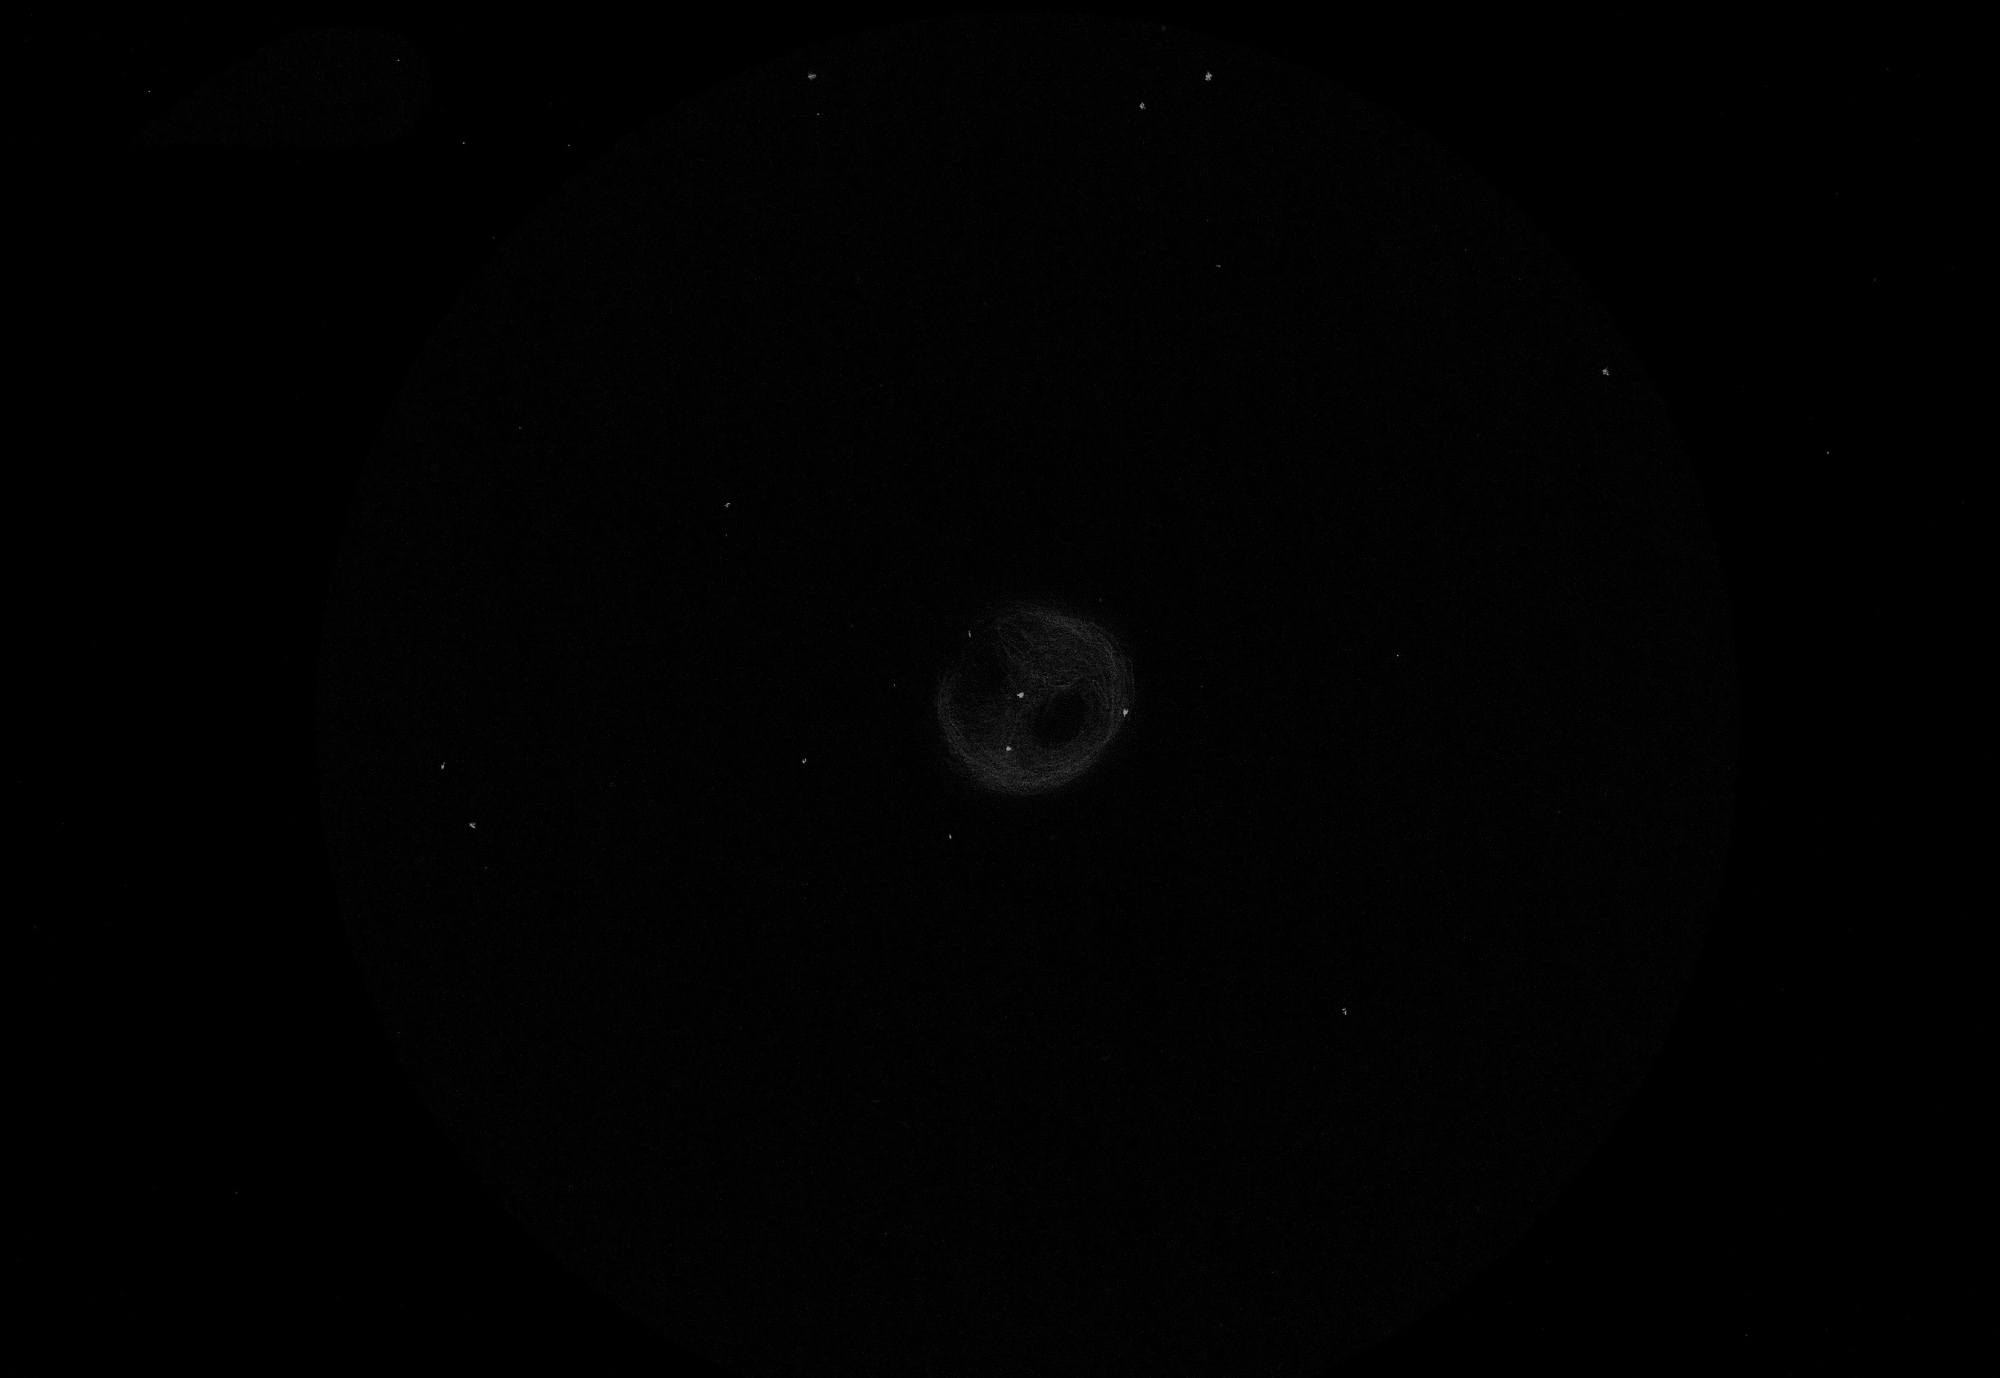 5b9e327093dfa_NGC2462.thumb.jpg.3c05539ef8e6f514f88c442e5f84a34c.jpg